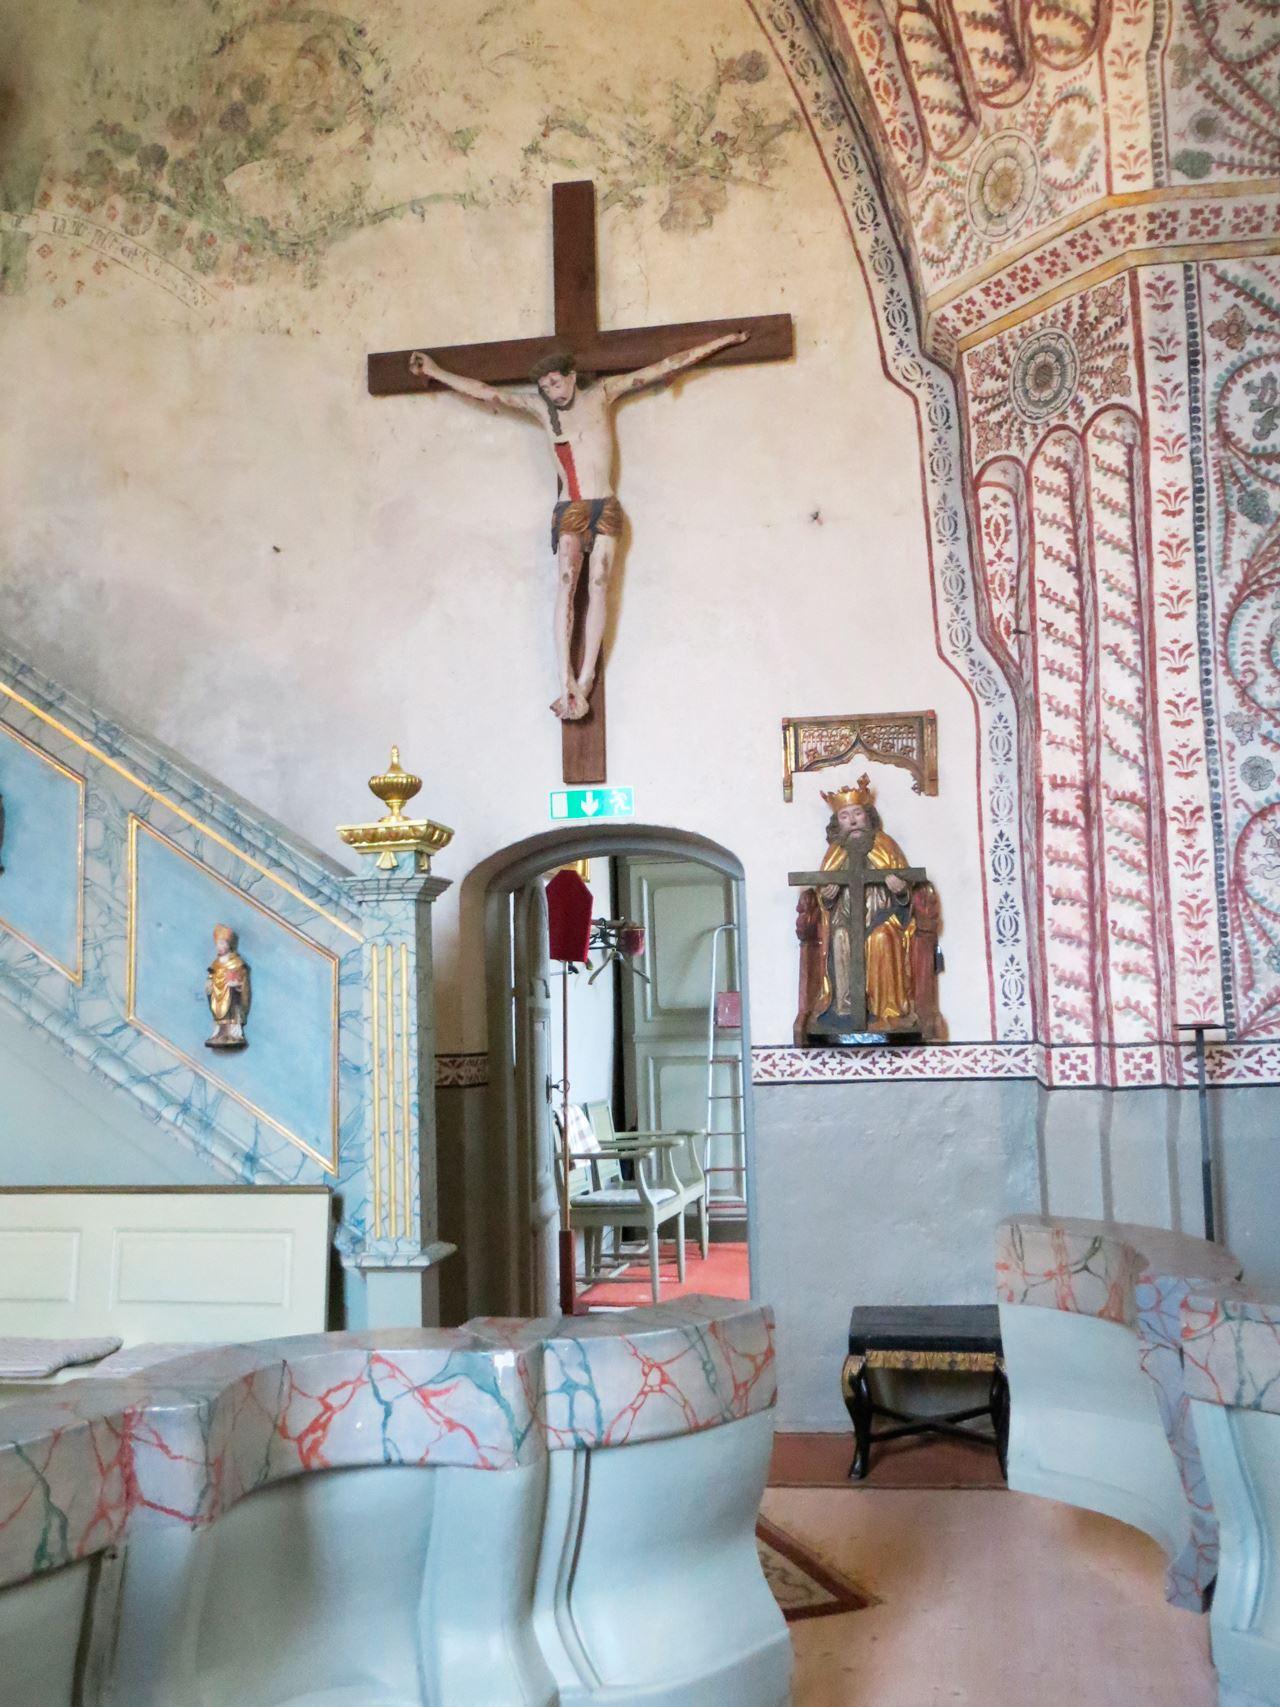 © Ådalsbygdens pastorat, Torsåkers kyrka